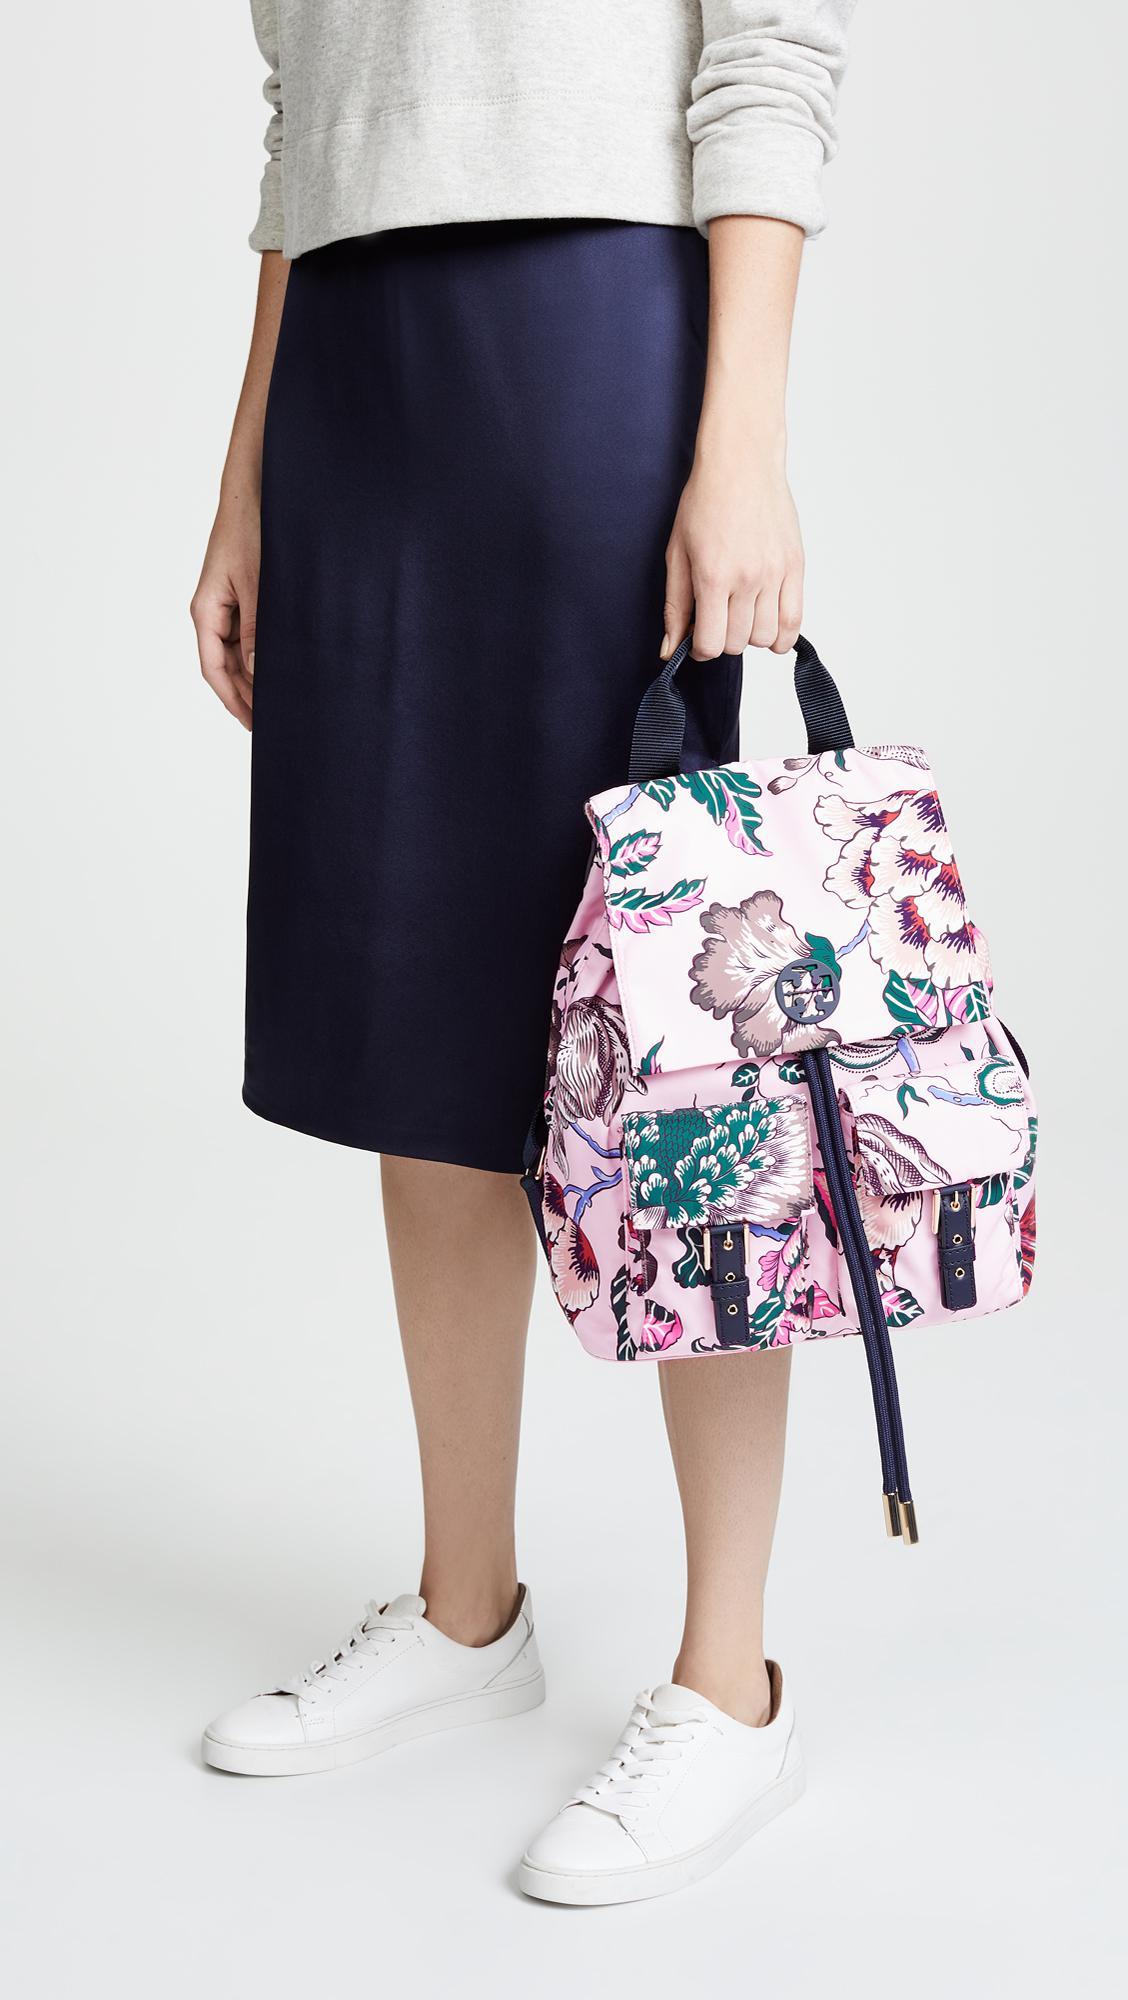 cbc65643670 Lyst - Tory Burch Tilda Printed Nylon Flap Backpack